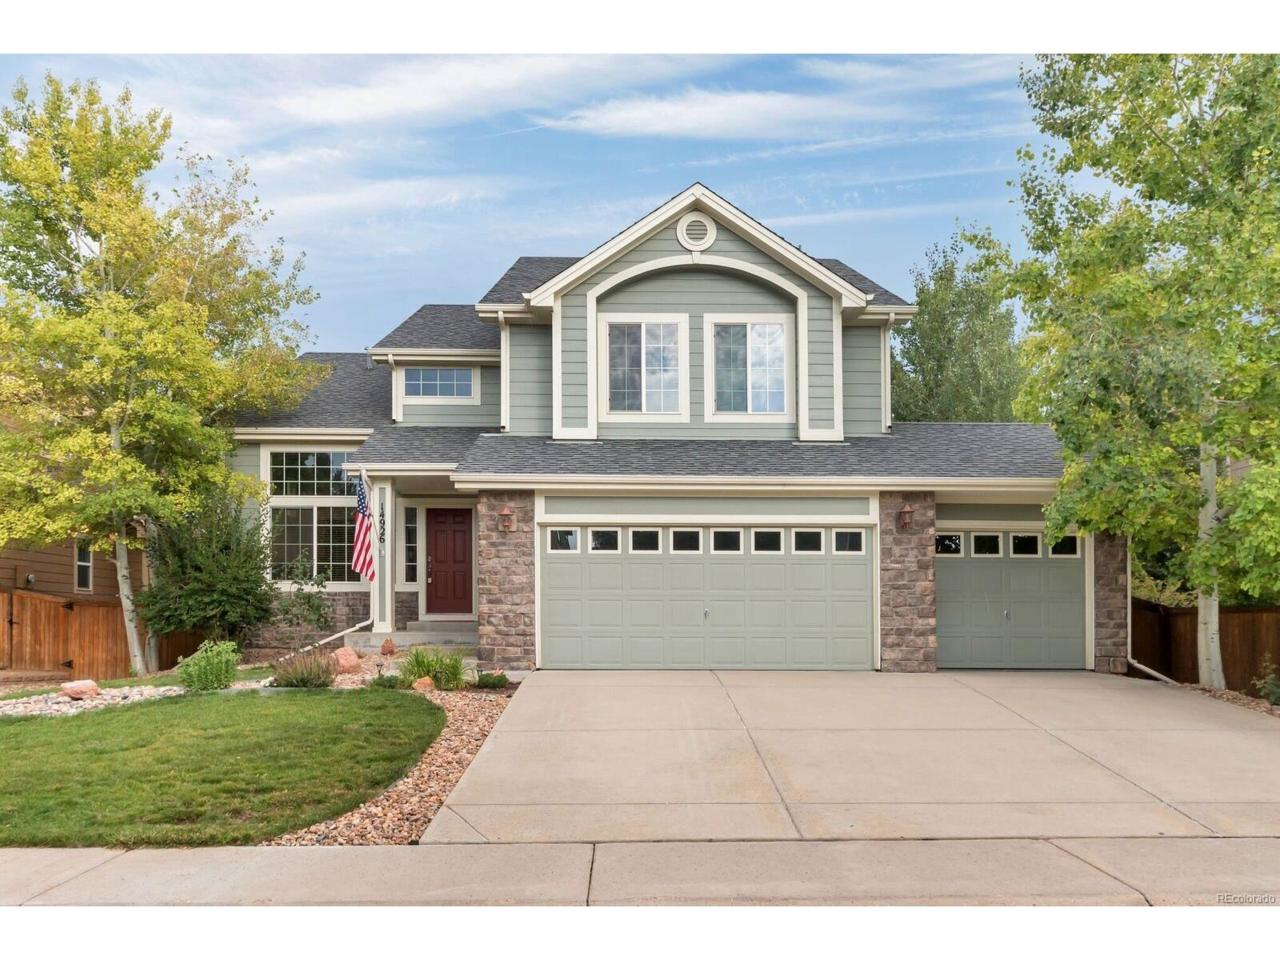 14926 Elizabeth Street, Thornton, CO 80602 (MLS #9404247) :: 8z Real Estate